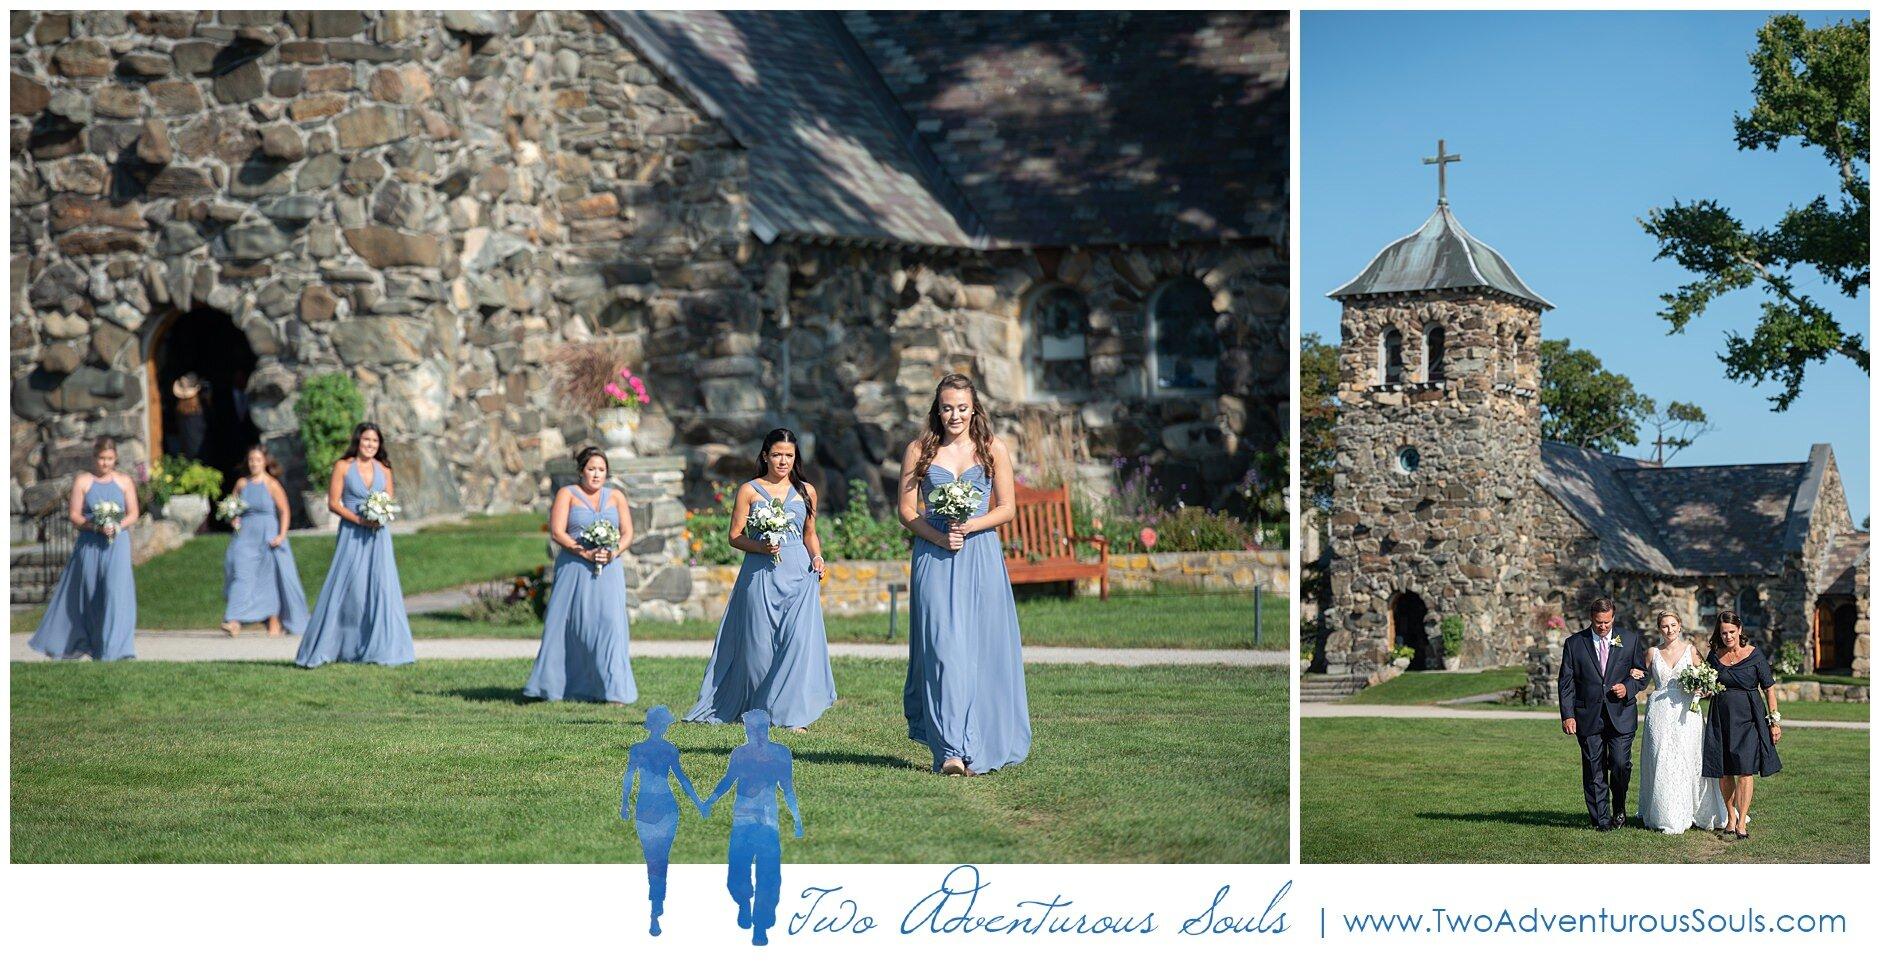 Breakwater Inn and Spa Wedding Photographers, Kennebunkport Wedding Photographers, Two Adventurous Souls- 092119_0027.jpg